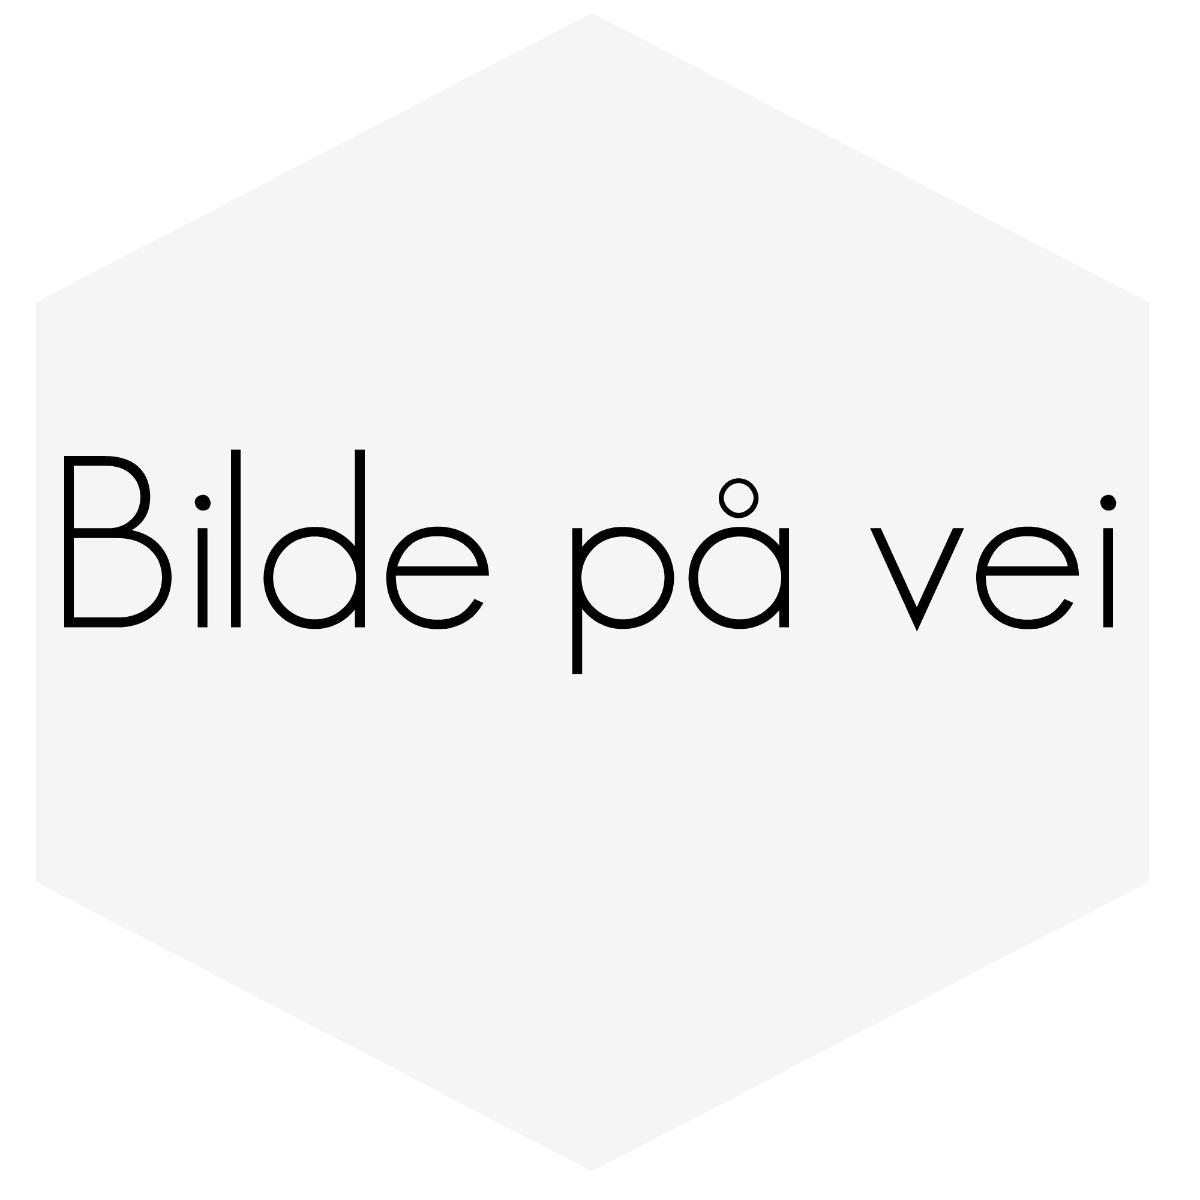 FJÆR GUMMI MANSJETT VOLVO V70N,S60,S80,XC70